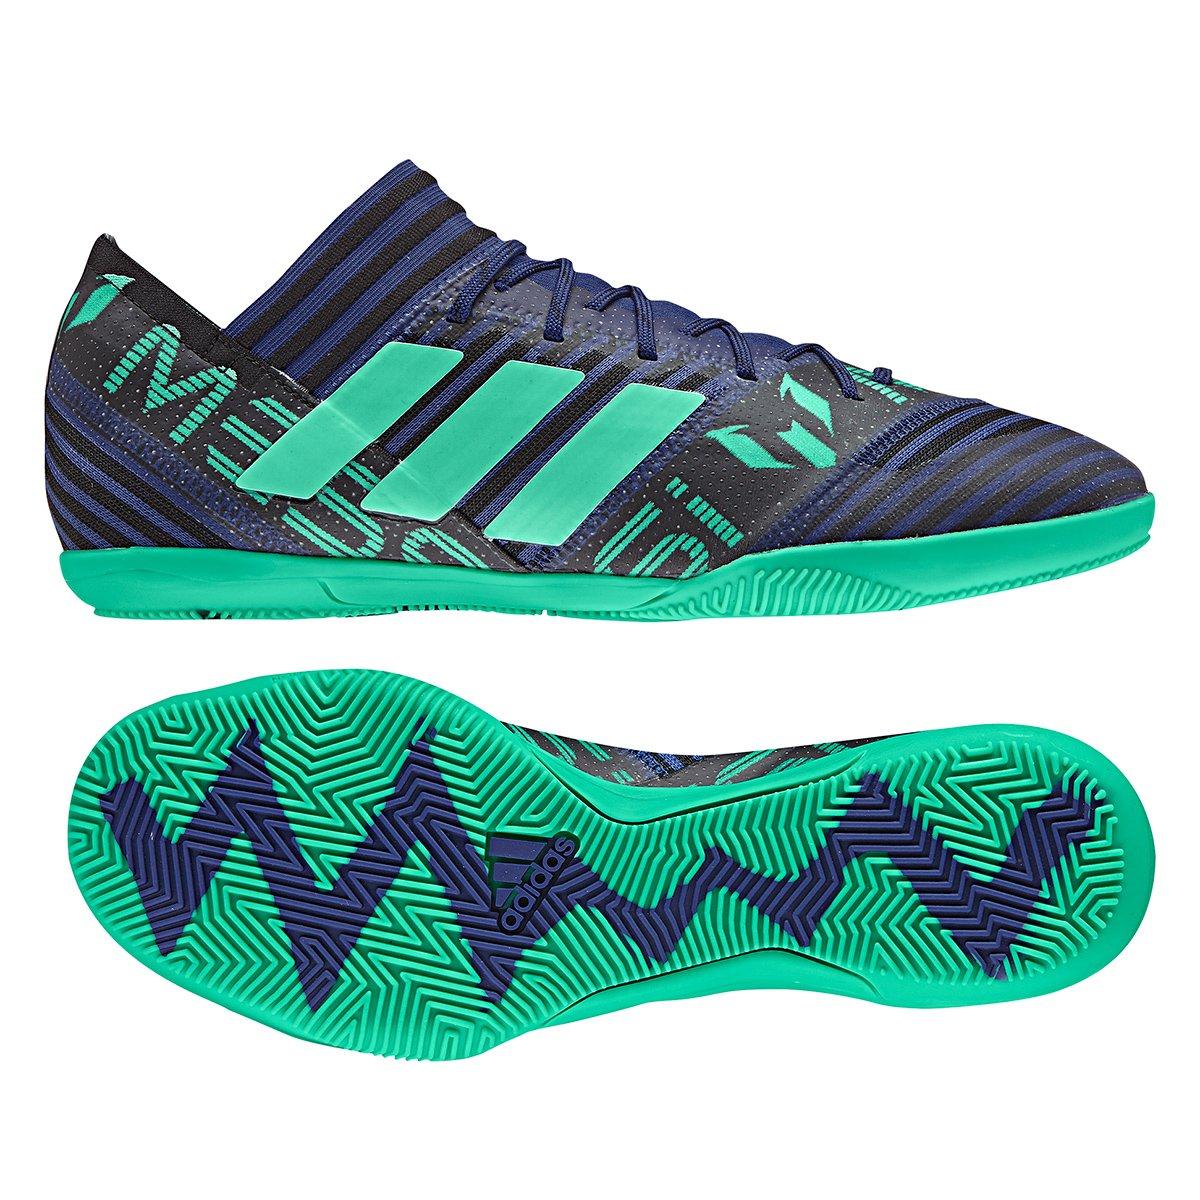 7346358cc051 Chuteira Futsal Adidas Nemeziz Messi 17.3 IN - Marinho e Preto - Compre  Agora